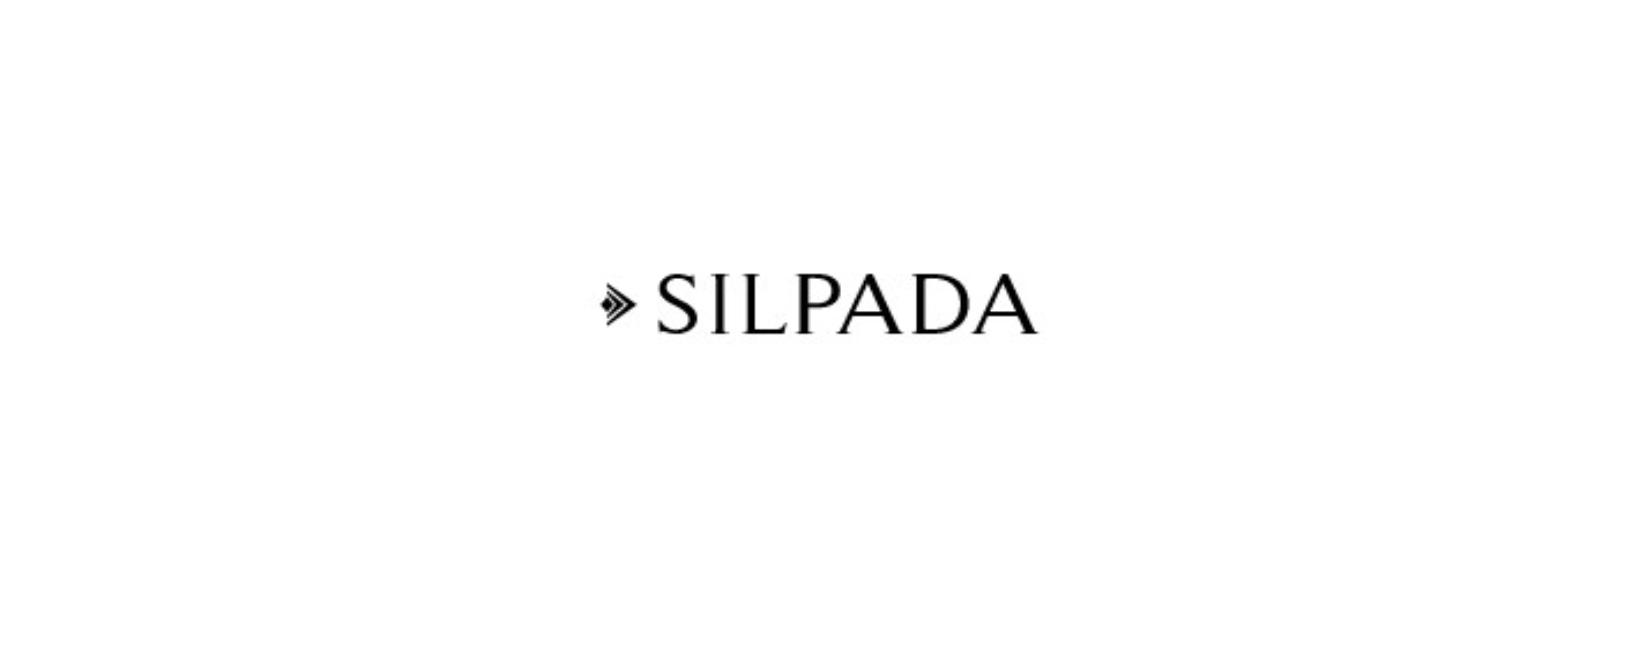 Silpada Discount Code 2021